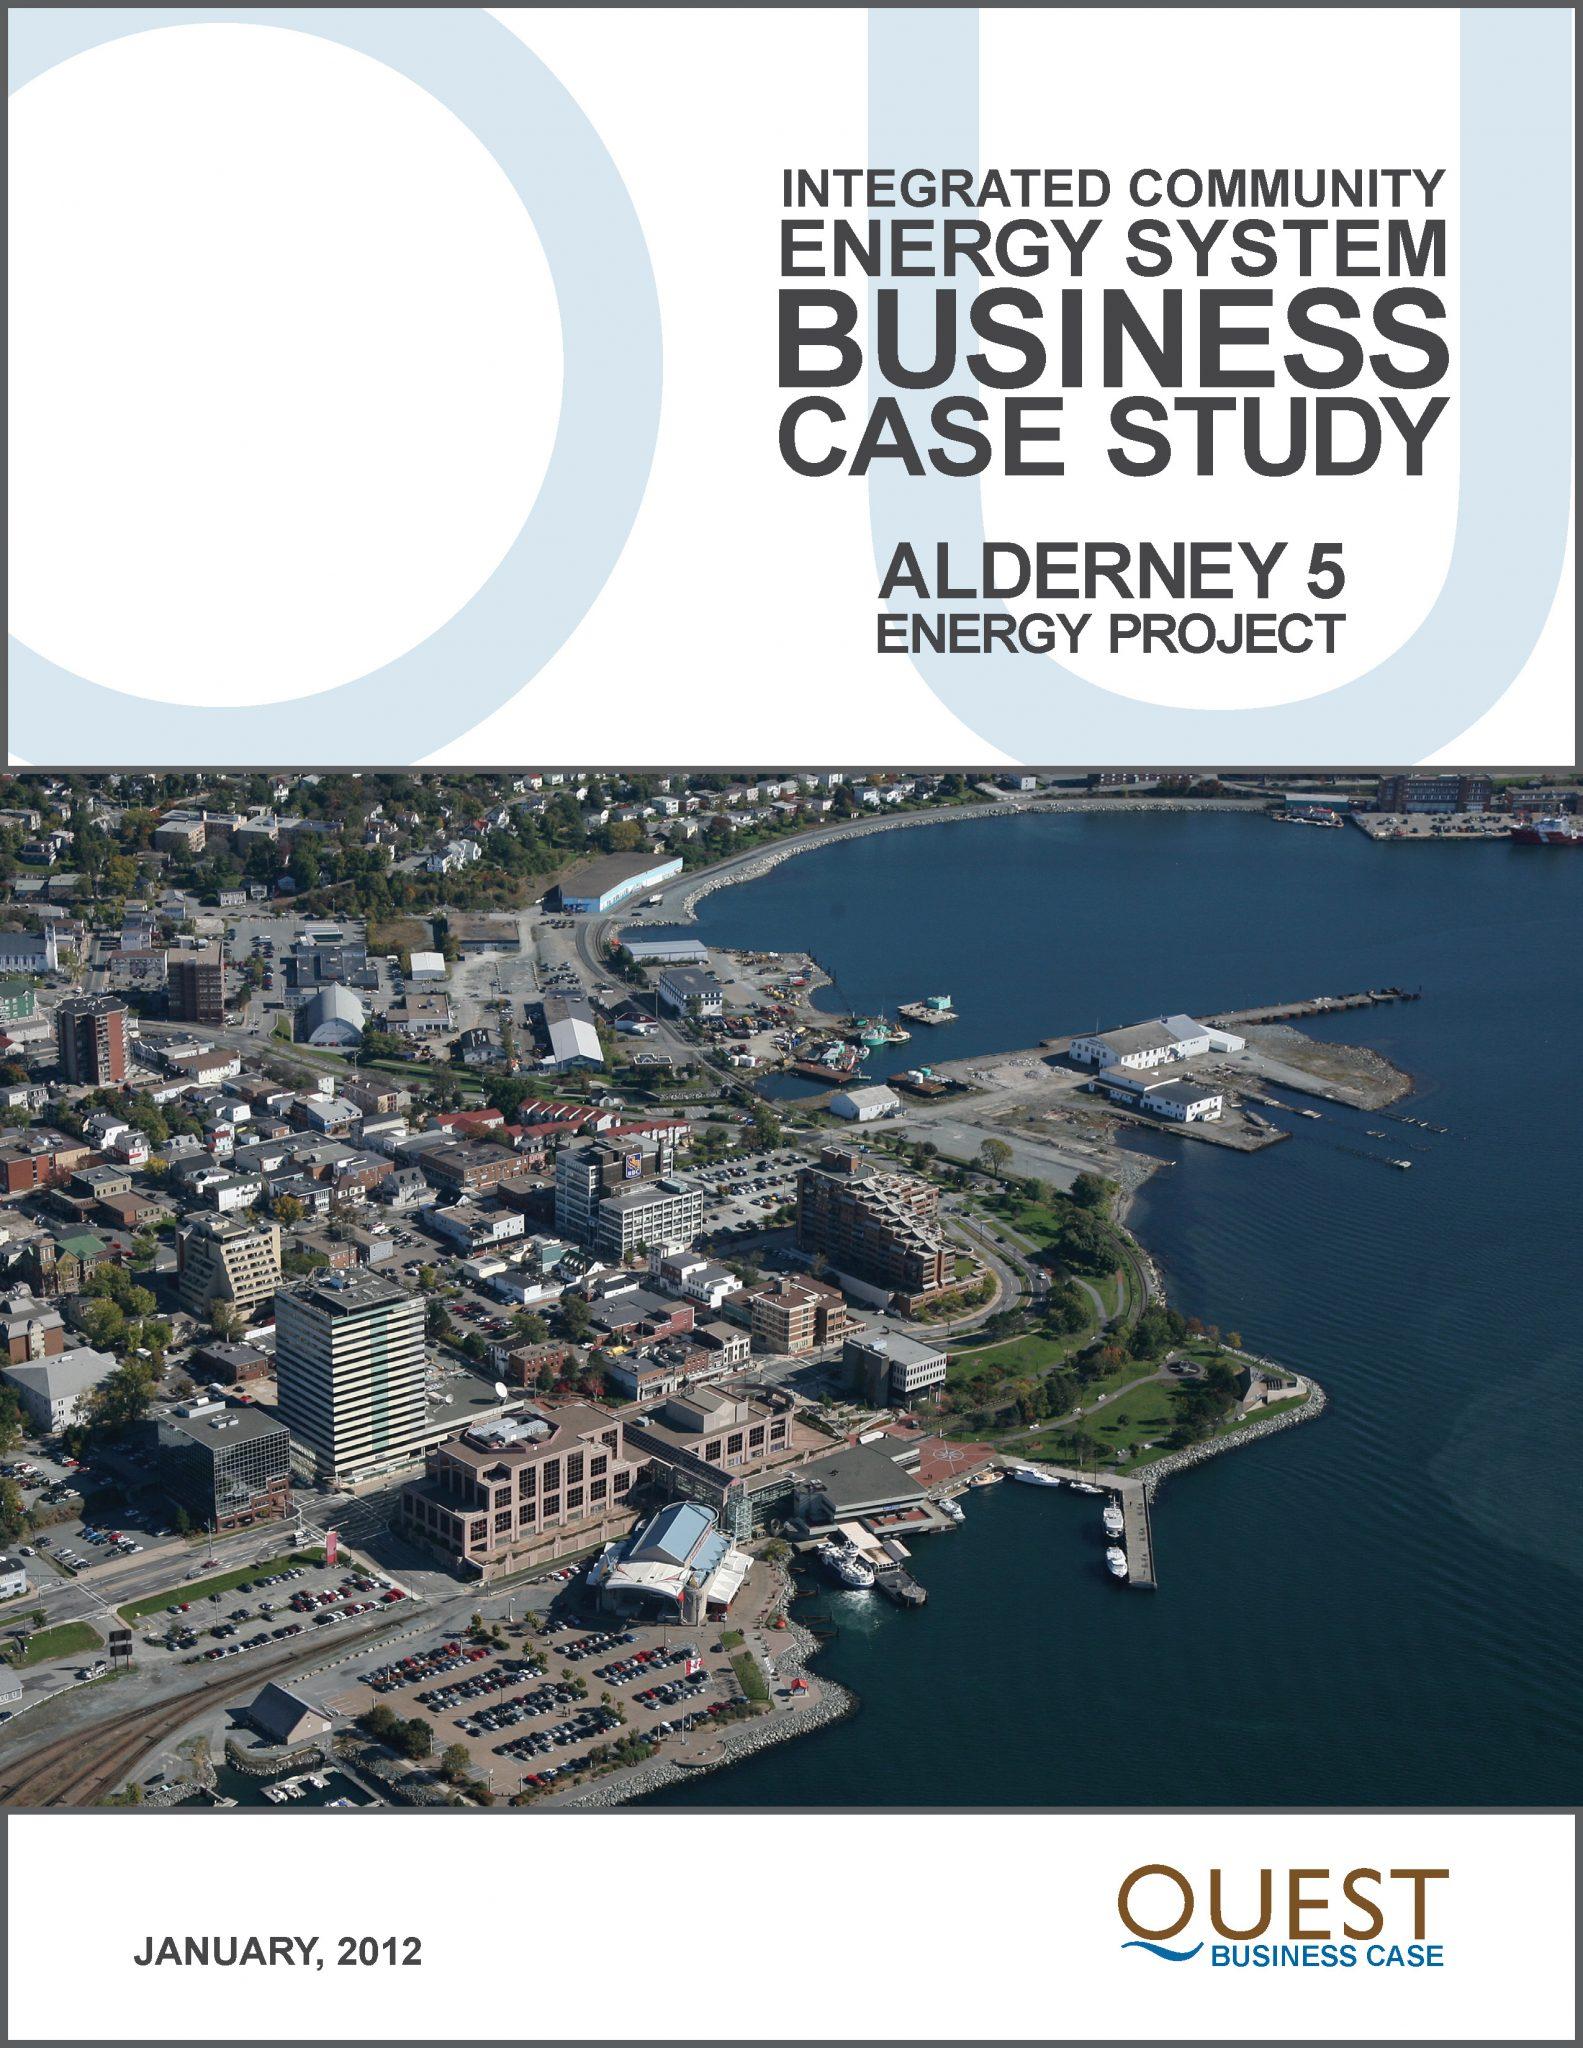 Alderney 5 Energy Project